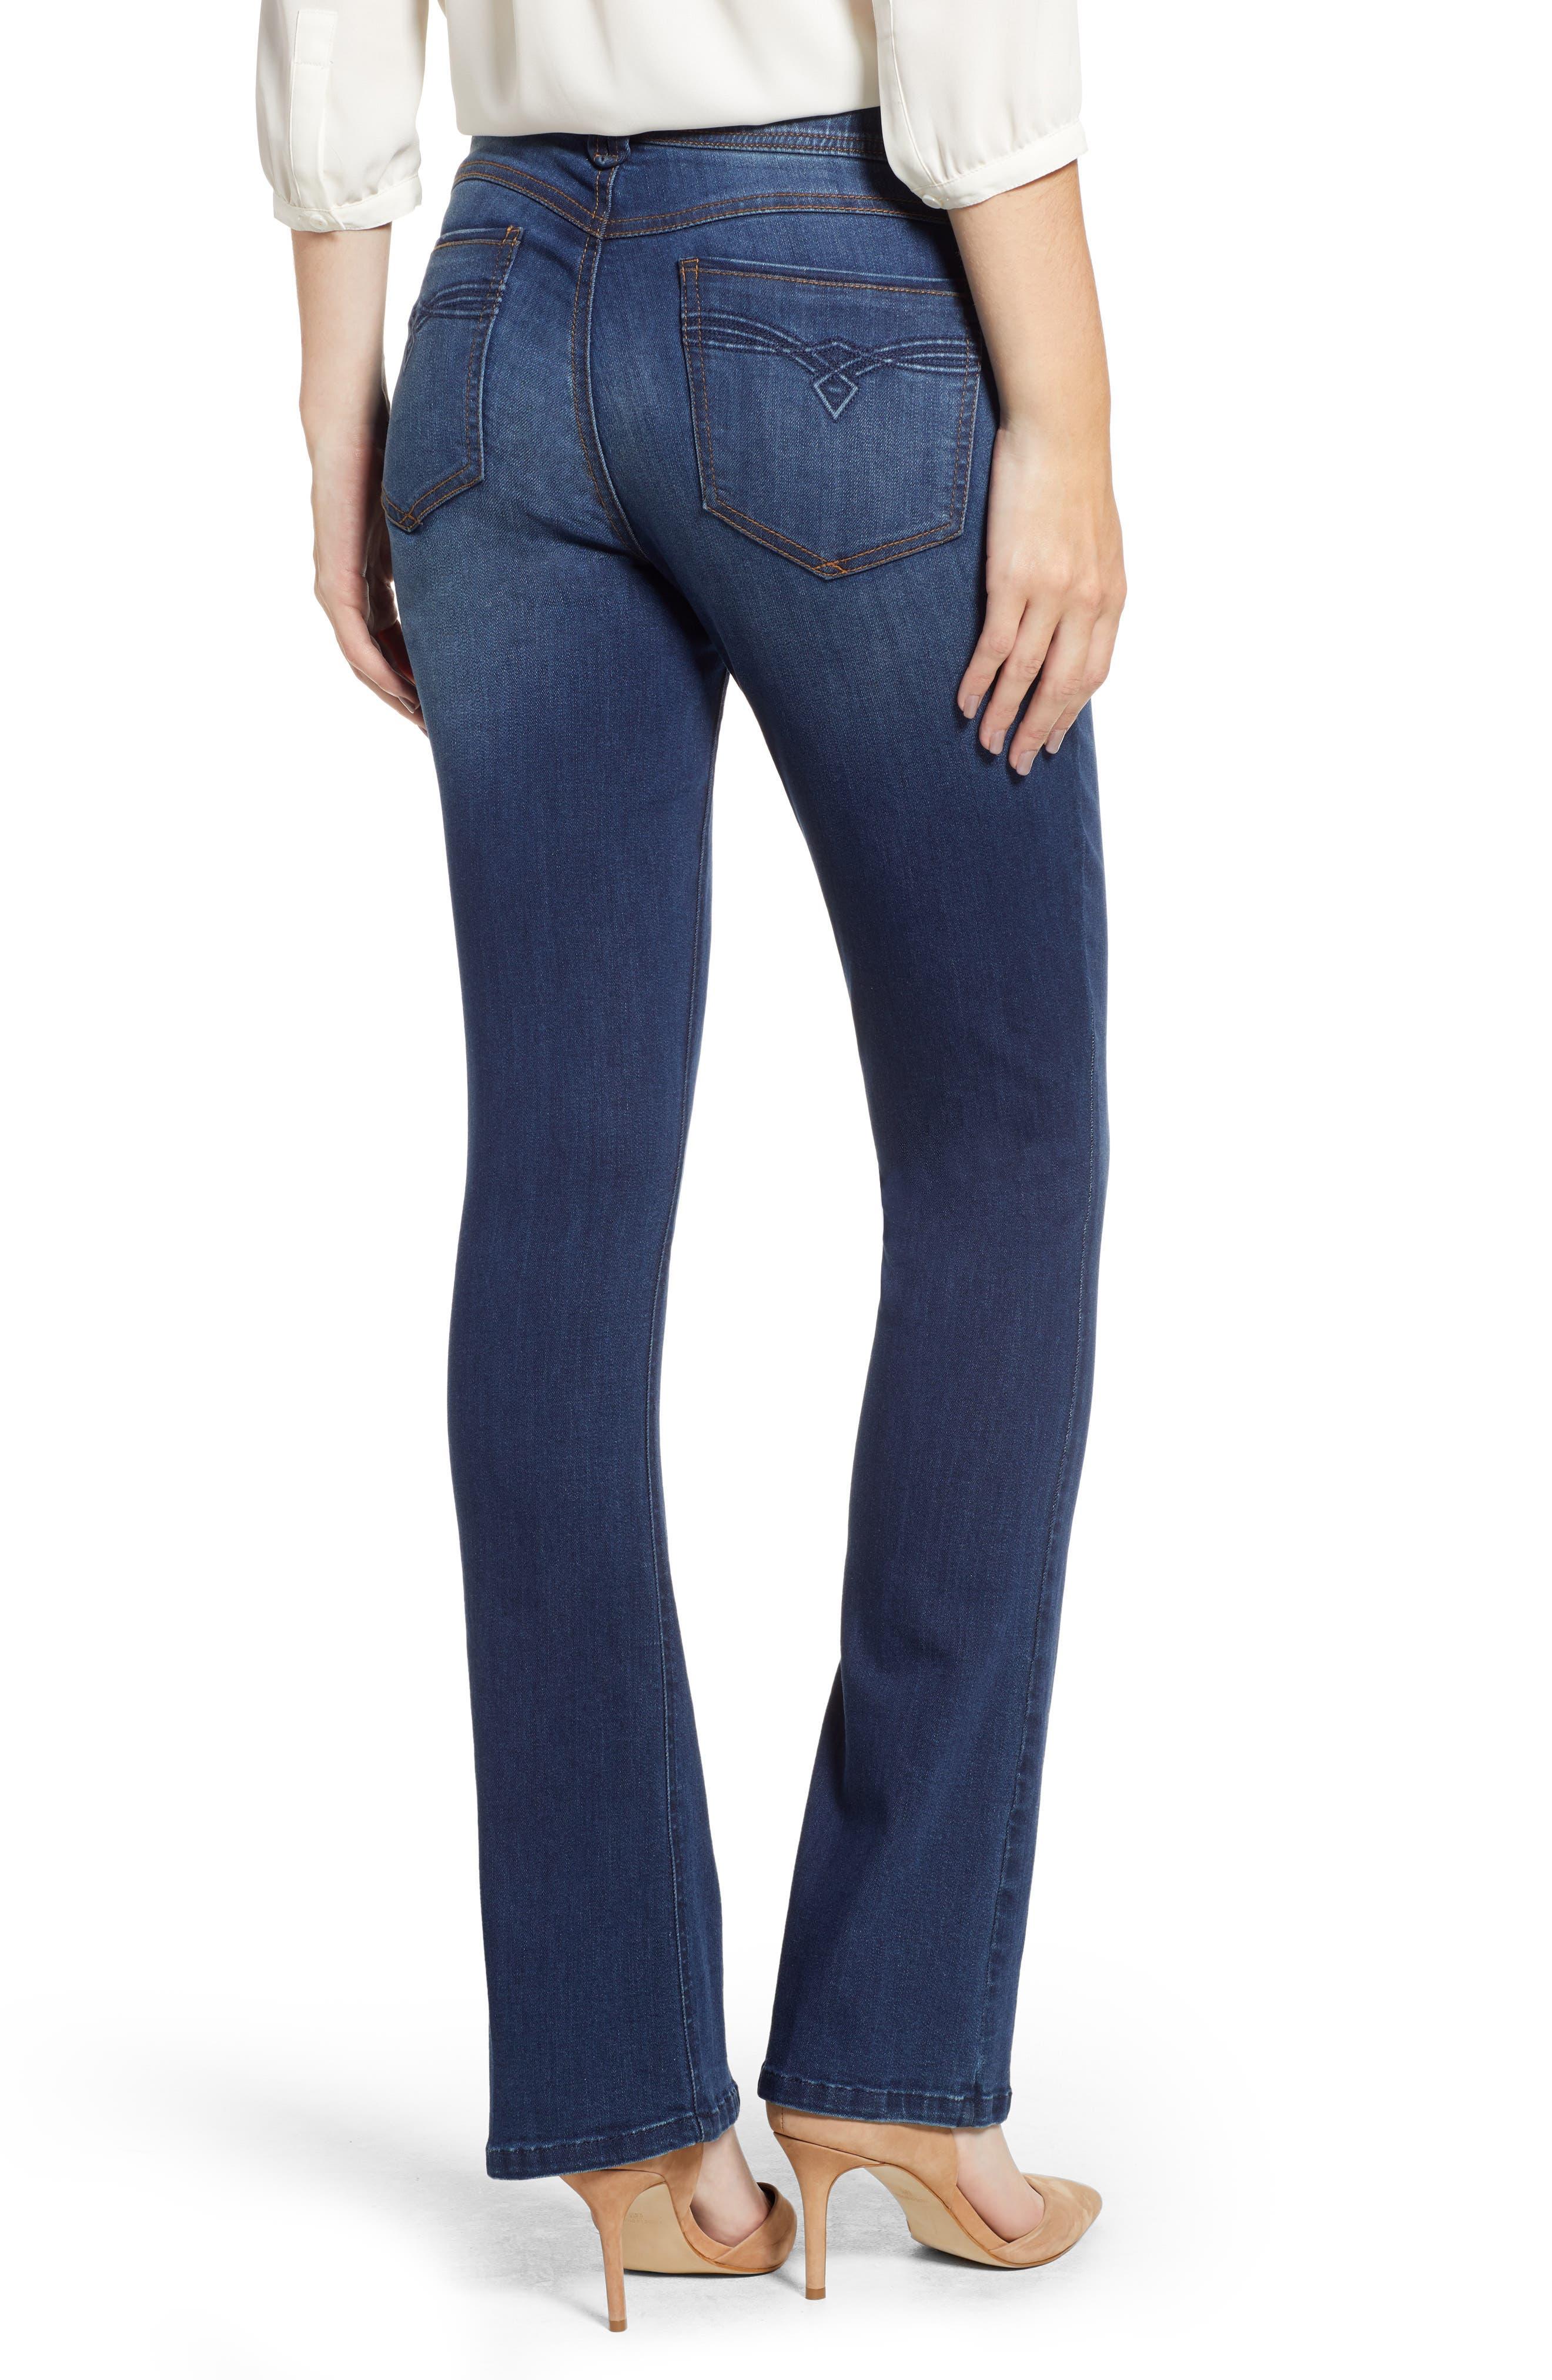 Ab-solution Luxe Touch Premium Jeans,                             Alternate thumbnail 2, color,                             420